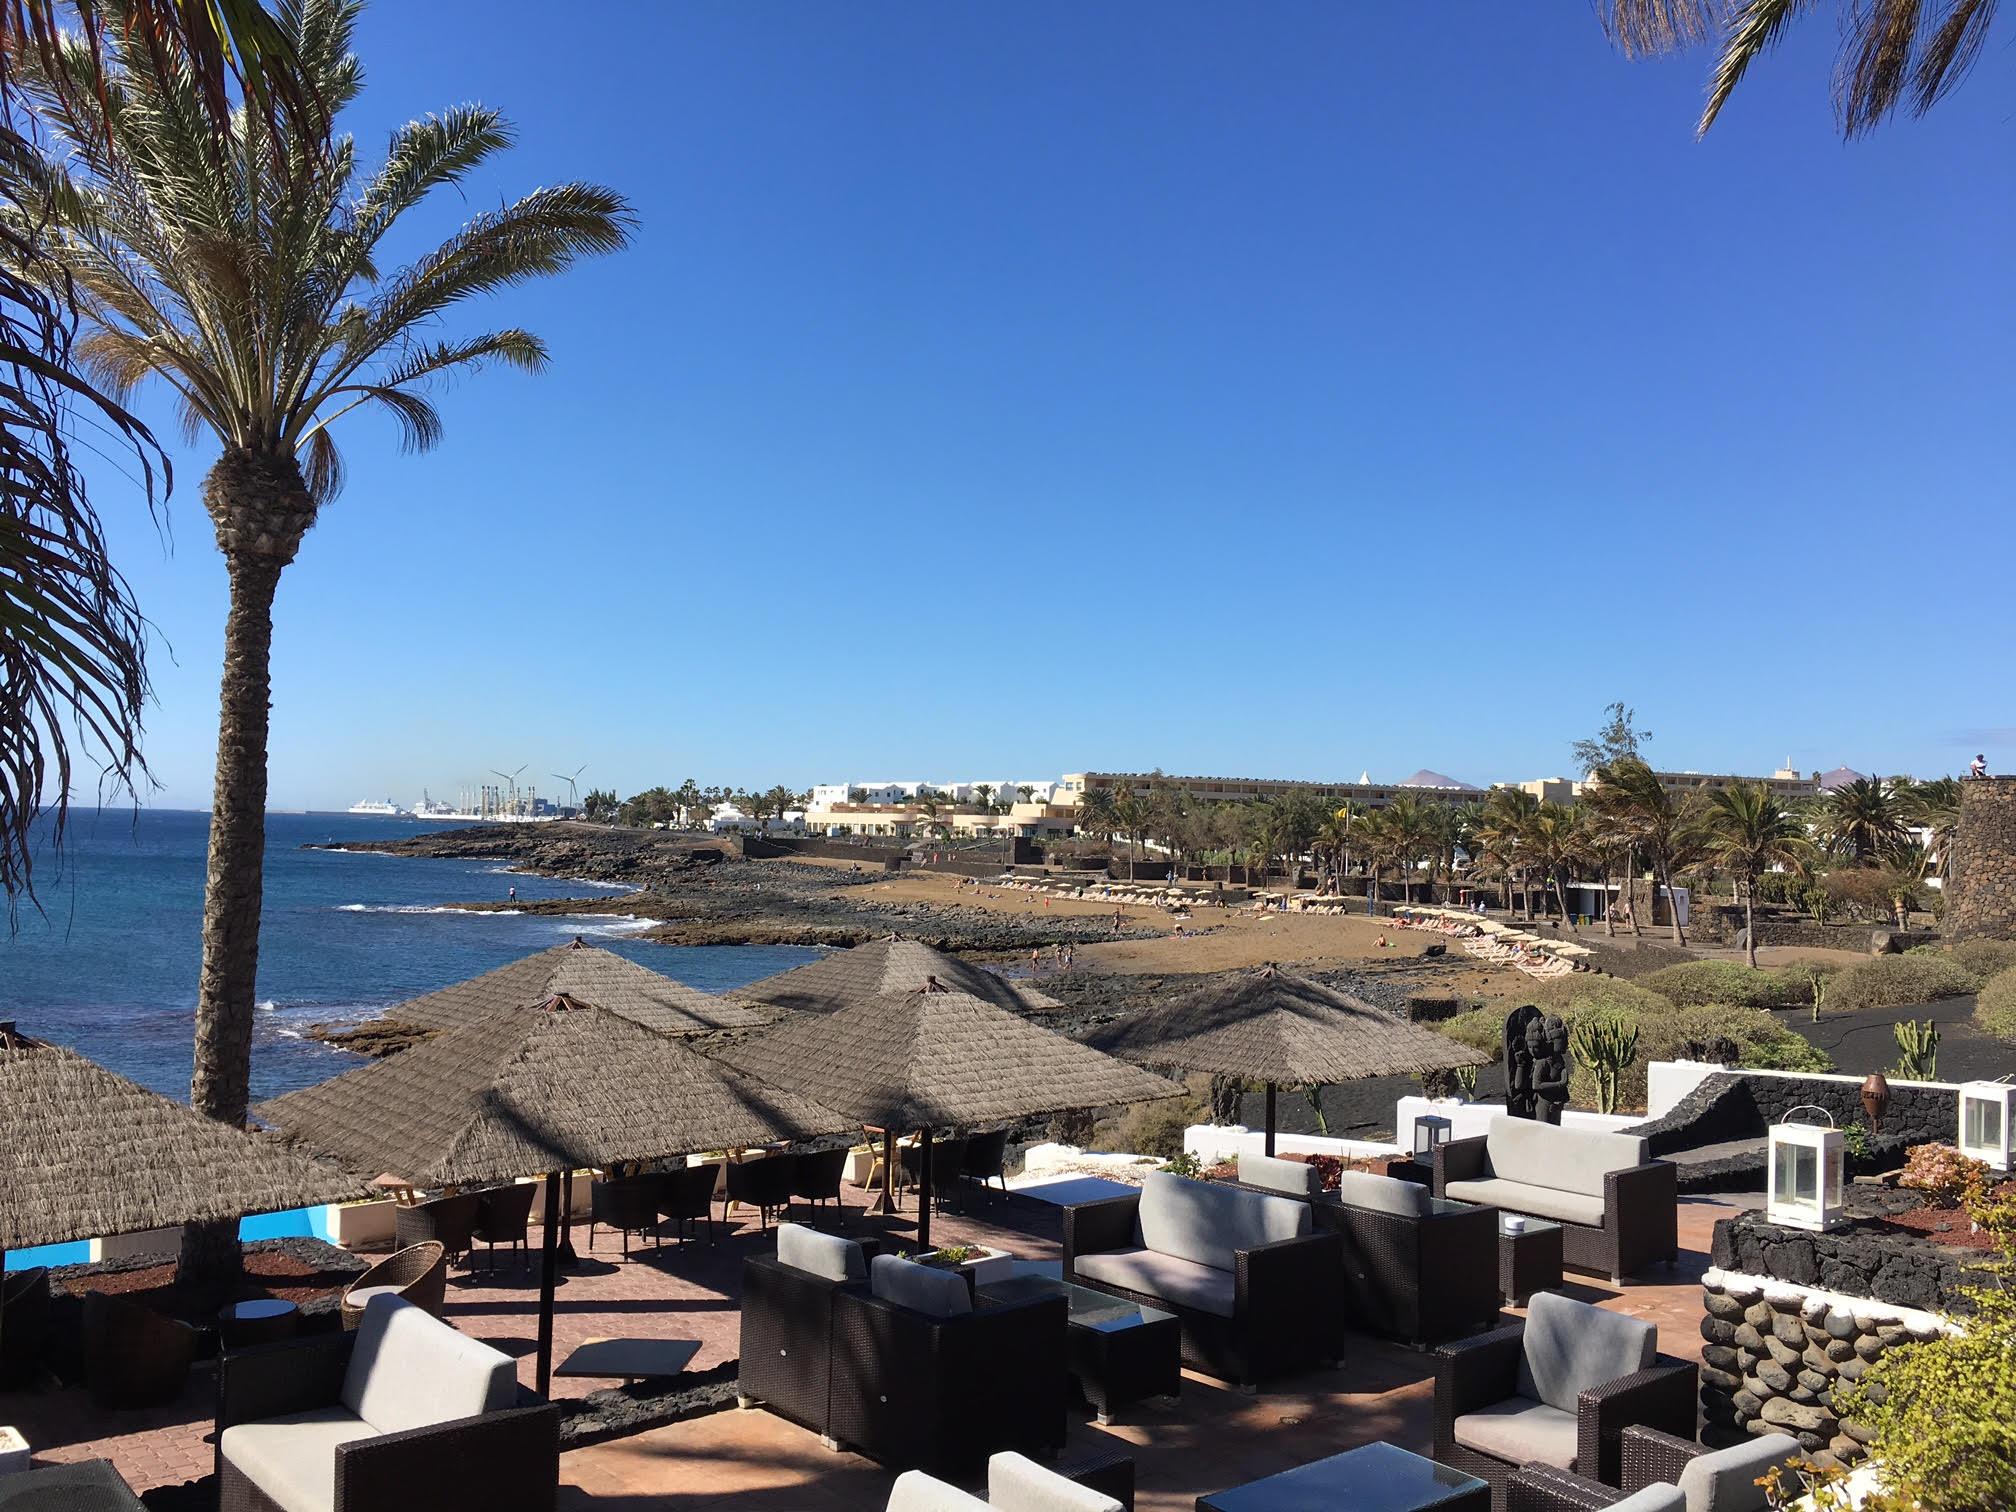 LVC215921 Villa Toledo and Playa Bastian Beach